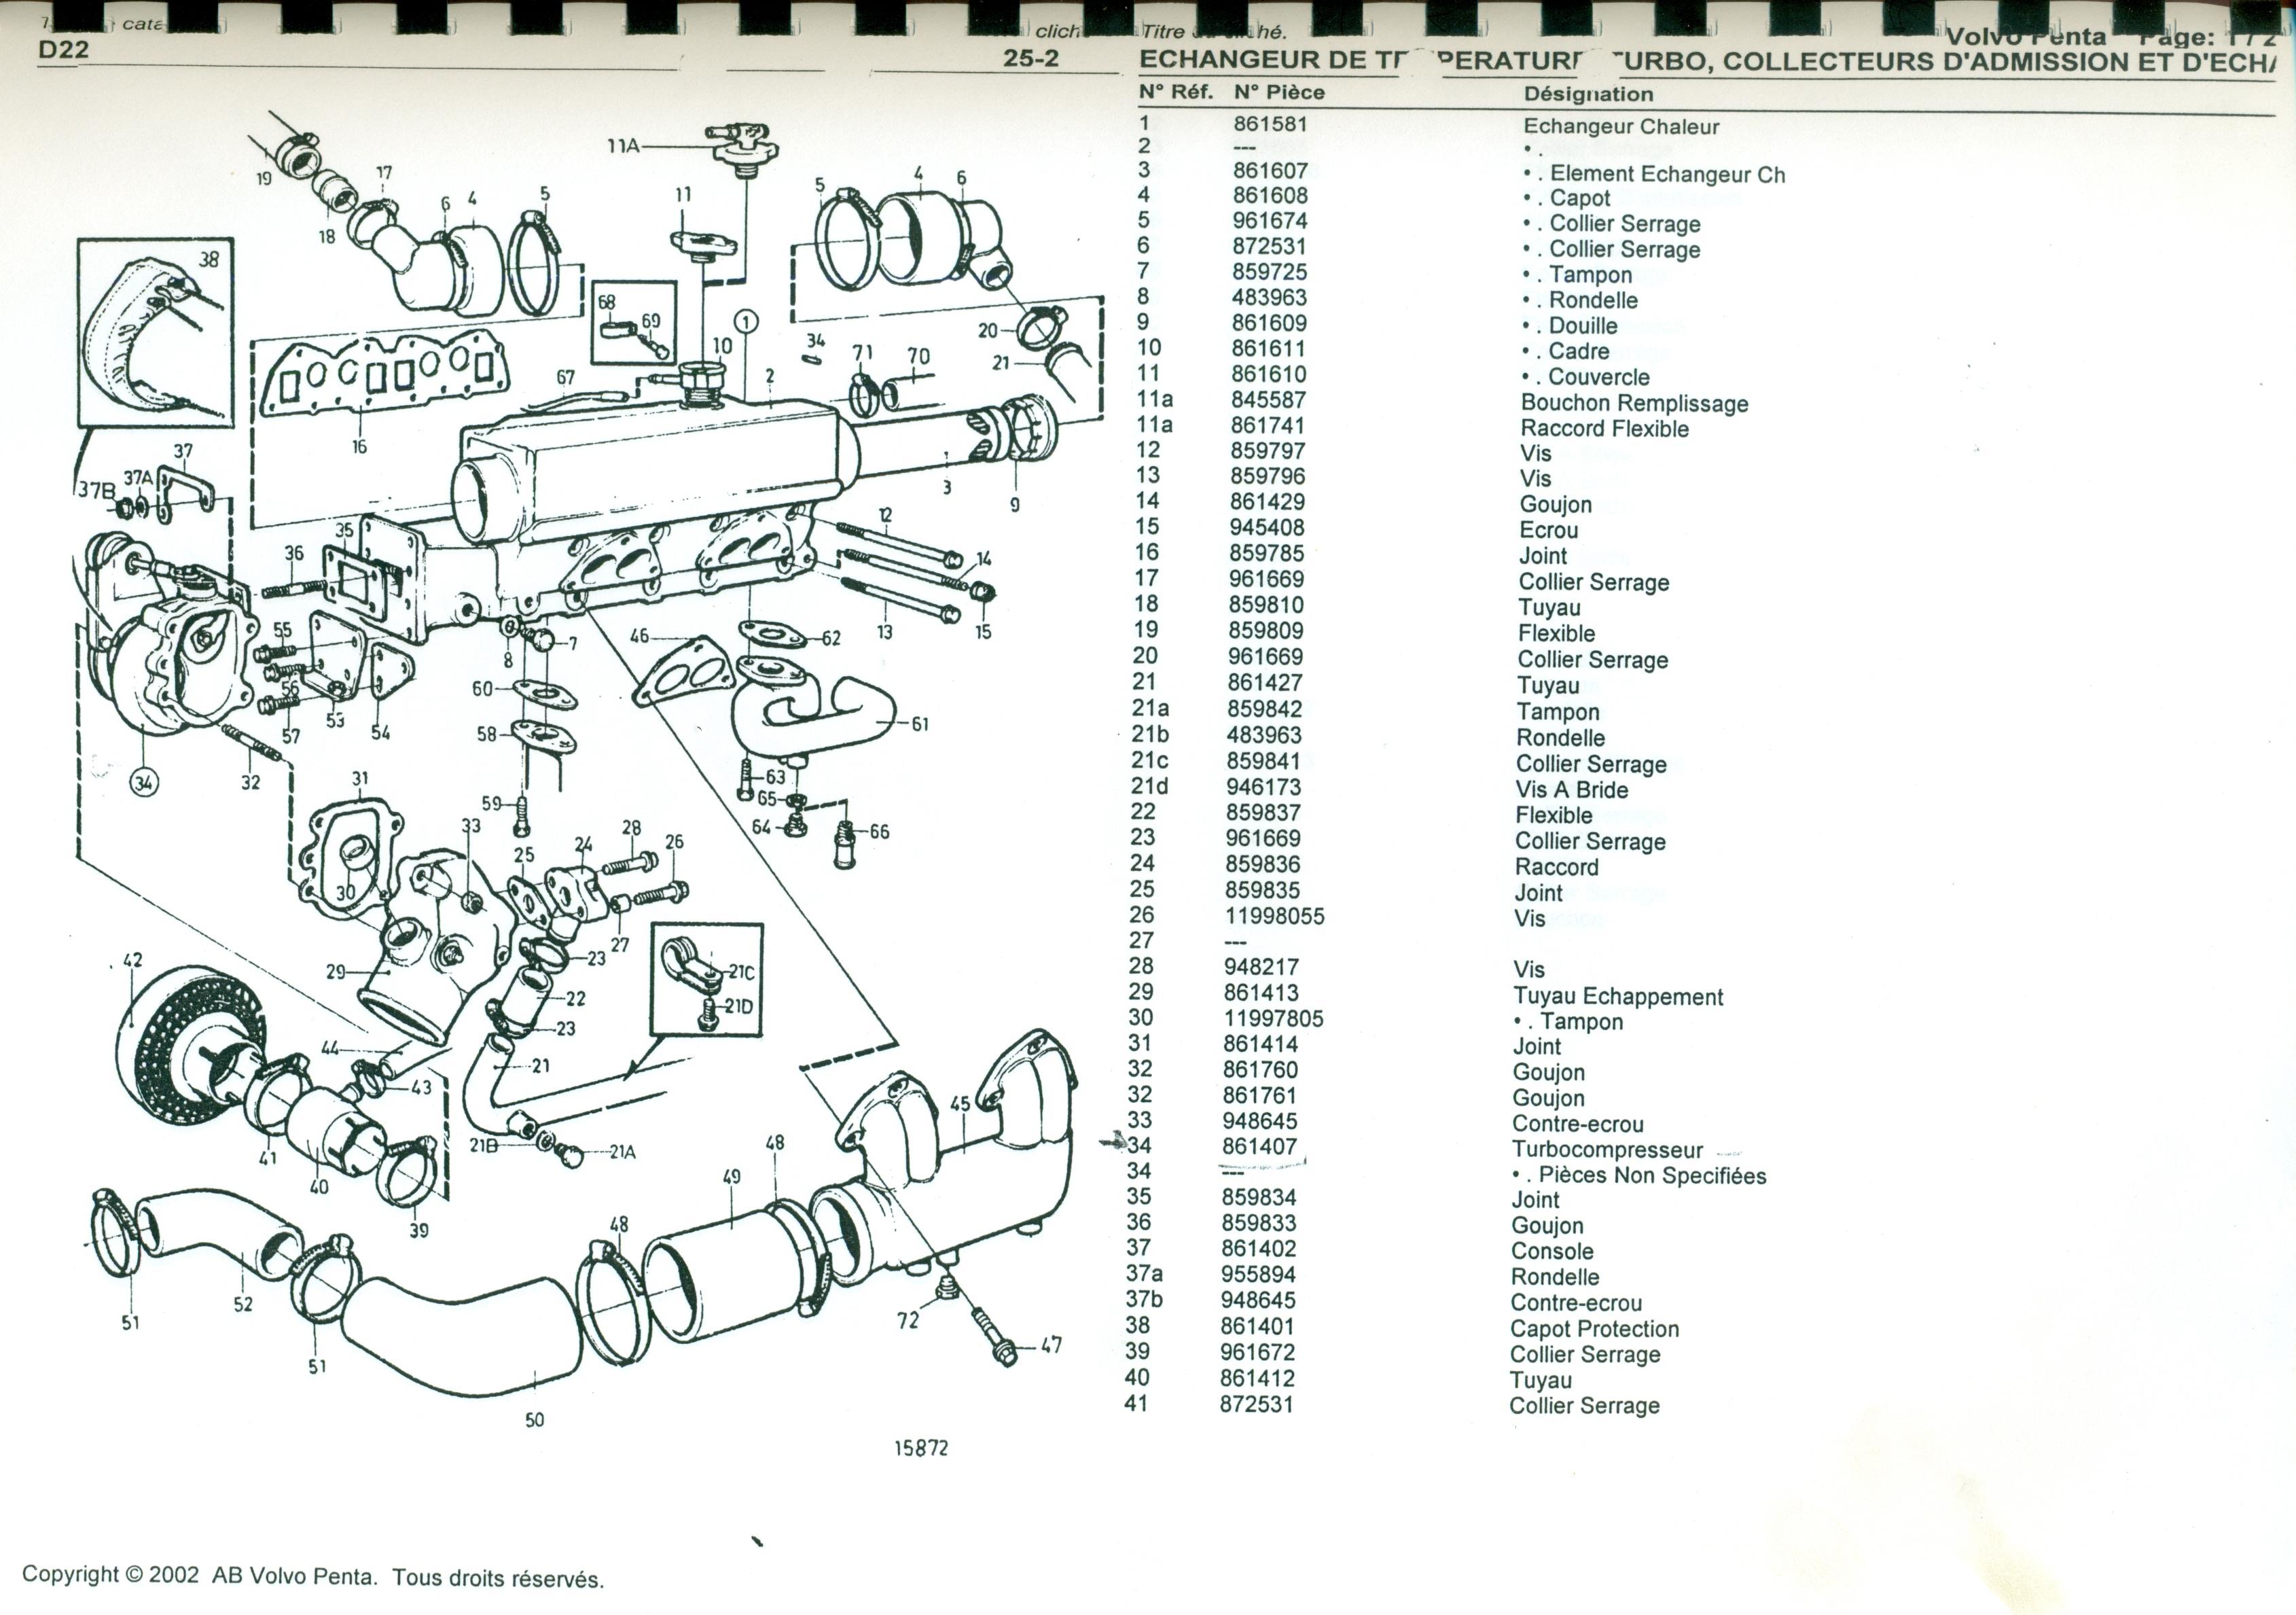 [QMVU_8575]  XT_6994] Diagram As Well Honda Cb 750 Engine Rebuild On Acura Mdx Remote  Start | Honda 4518 Wiring Diagram |  | Weveq Bapap Basi Wigeg Mohammedshrine Librar Wiring 101